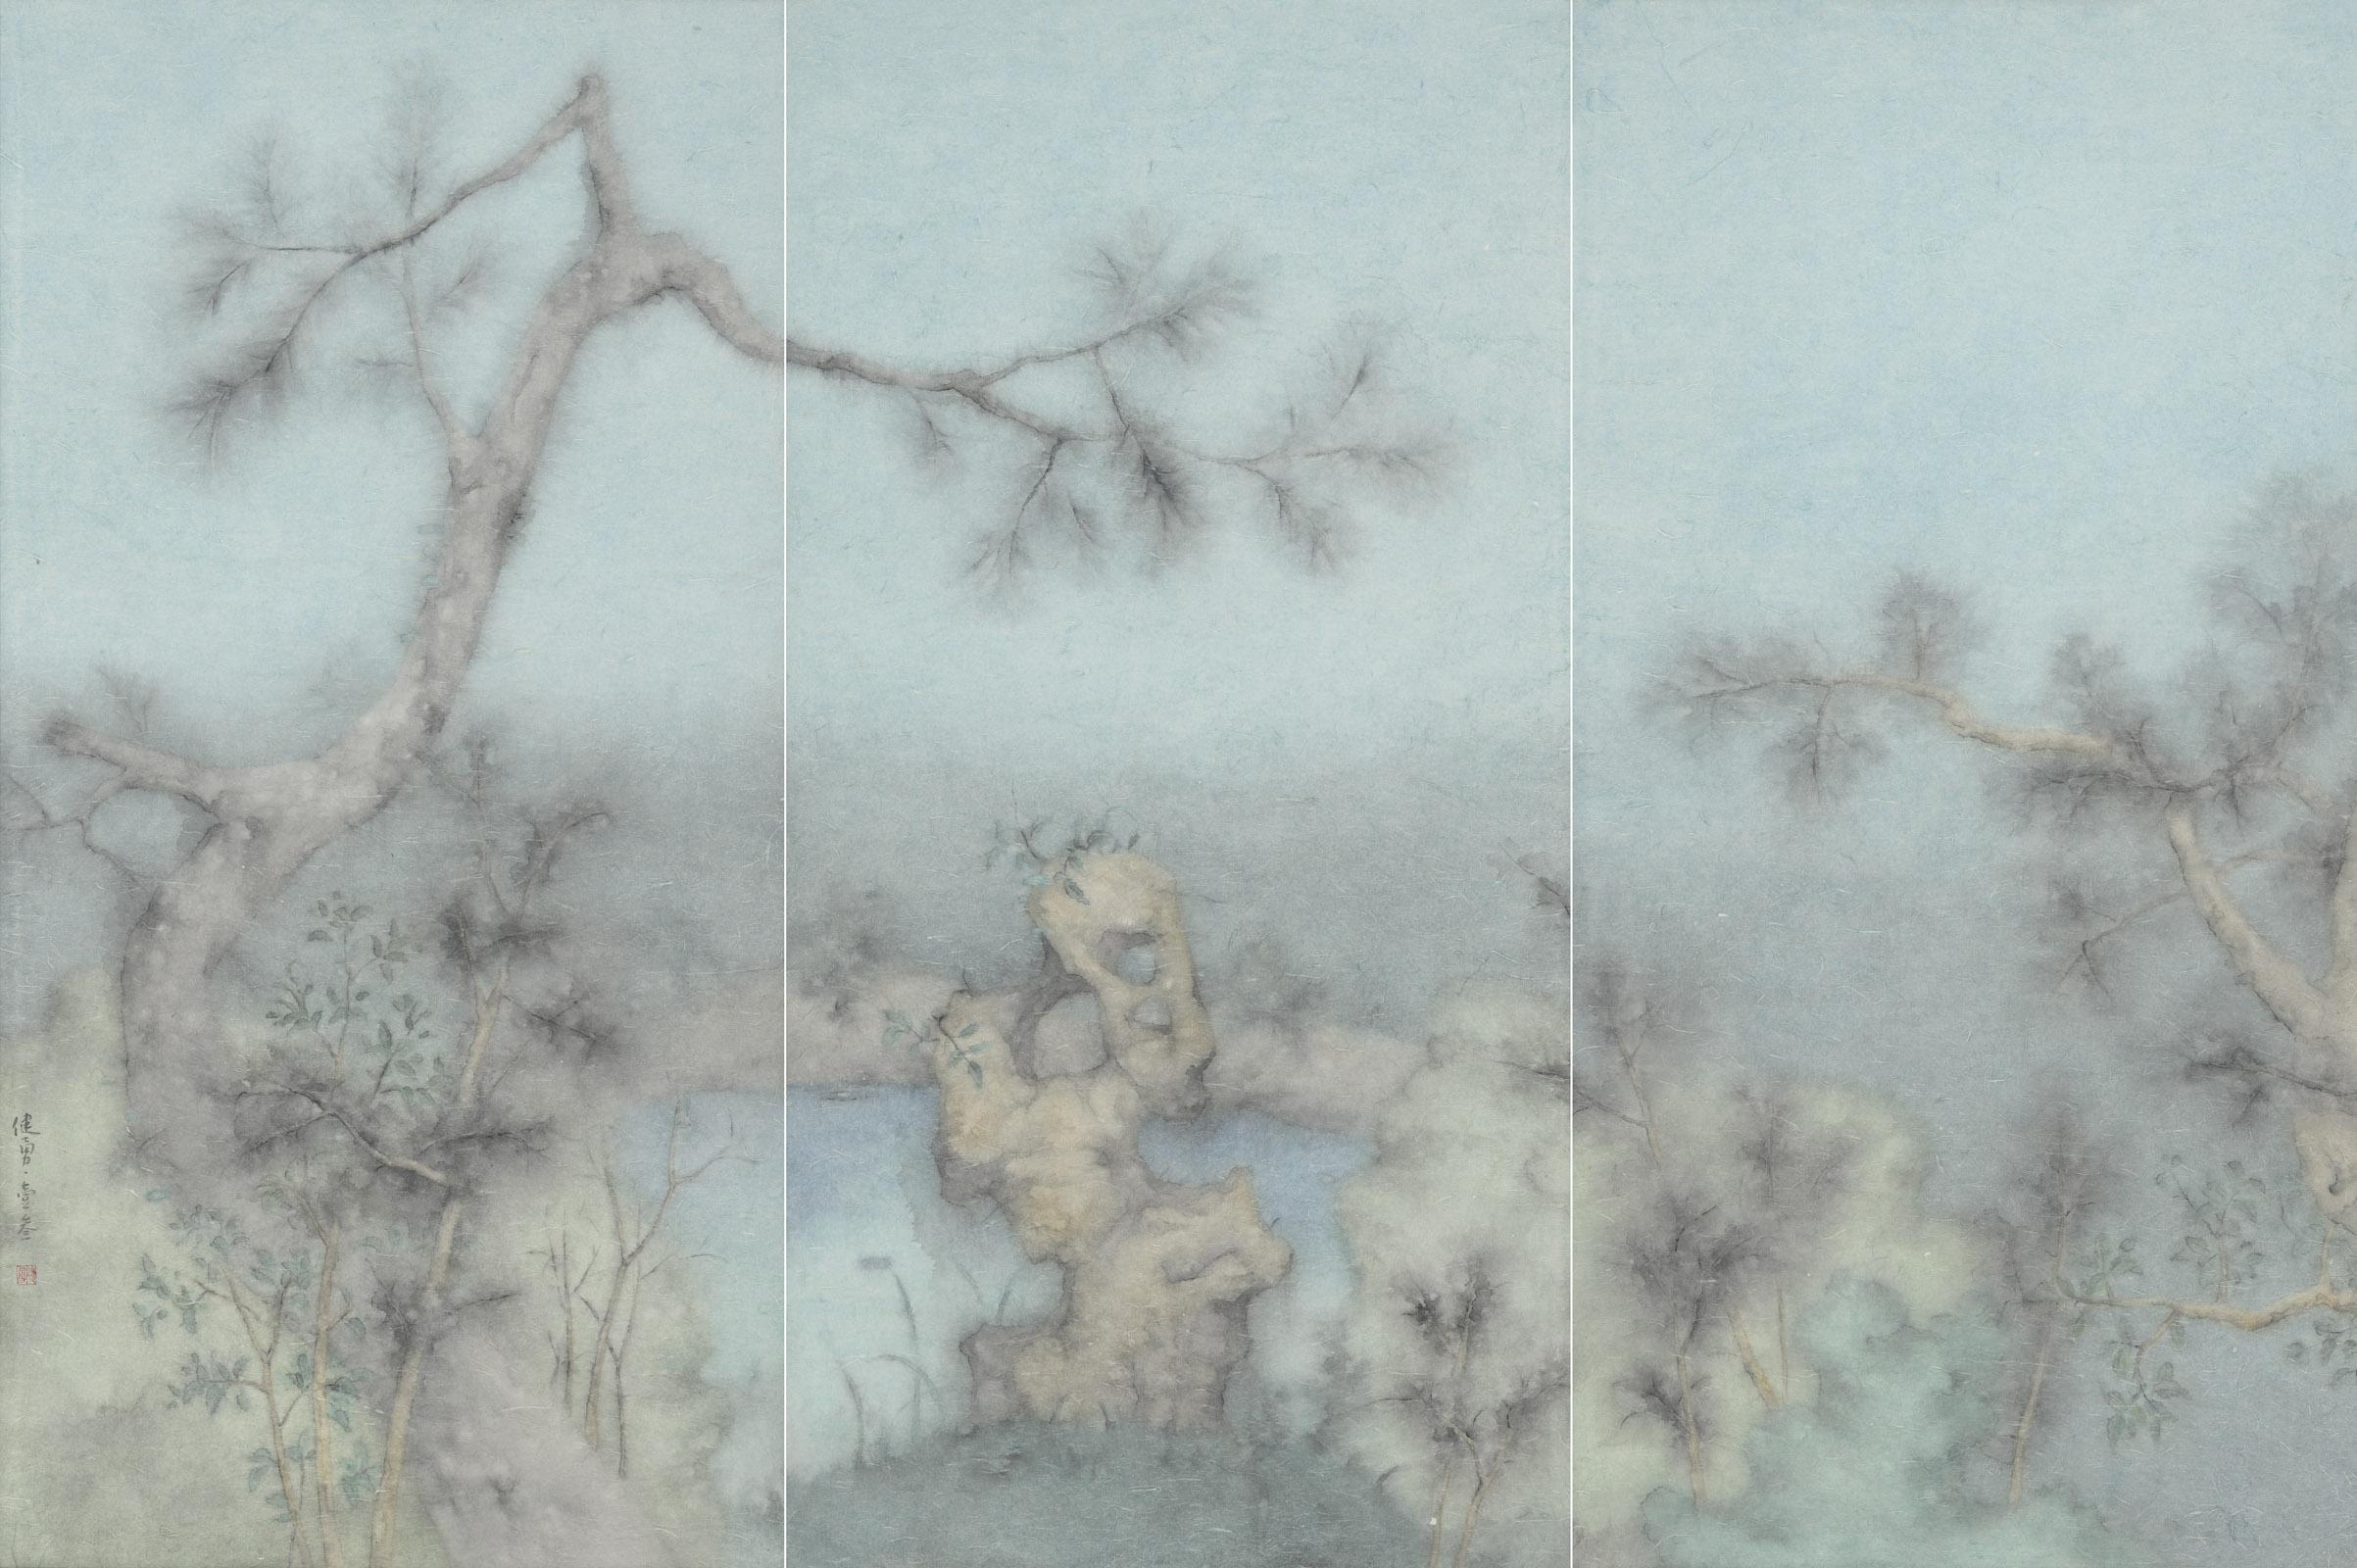 Zeng Jianyong 曾健勇, Specimen of the Hometown Garden No.2 故园标本之二, 2013, 144 x 72 cm x 3